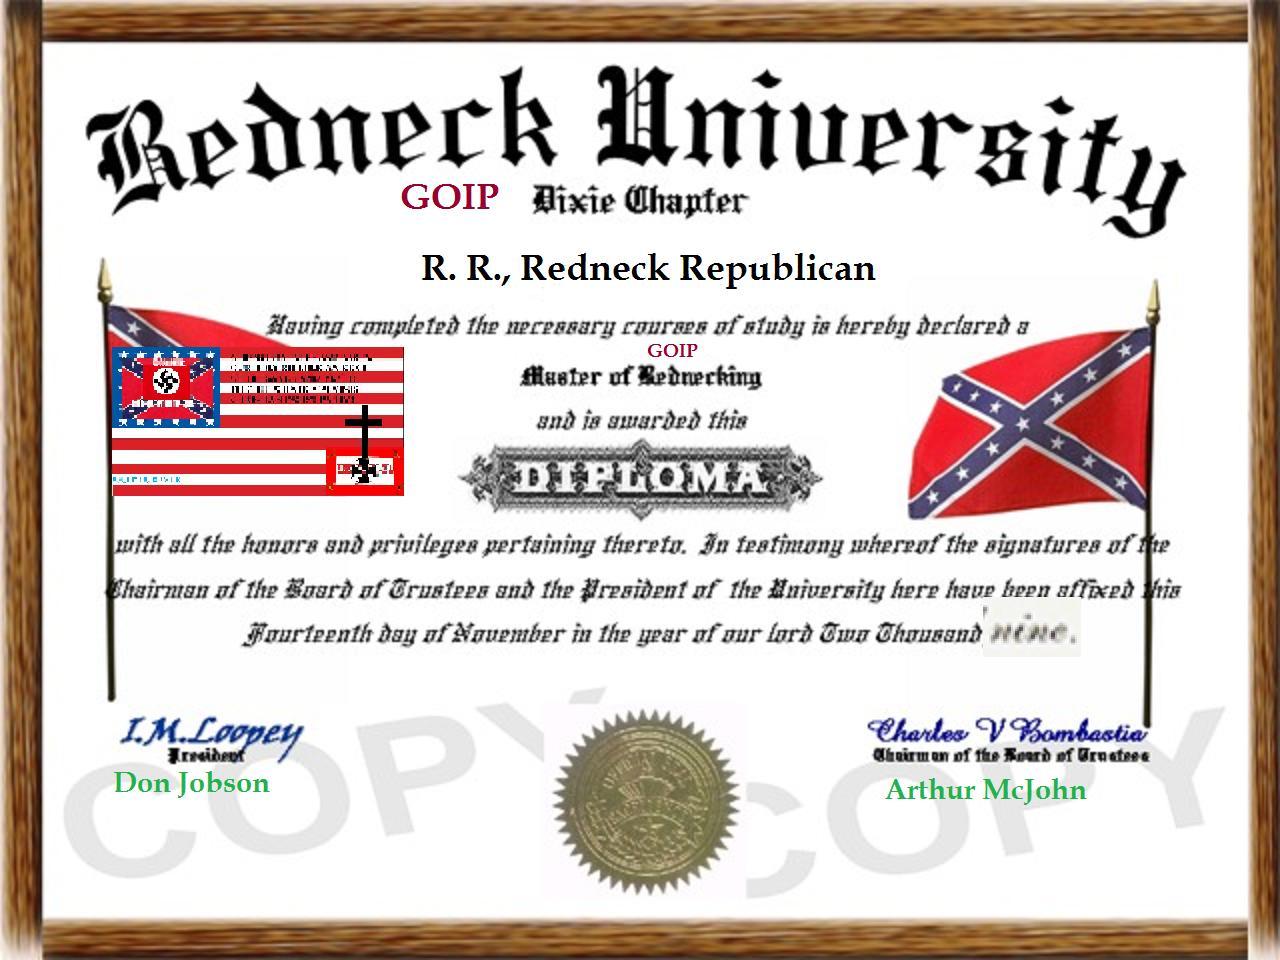 Redneck Republicans